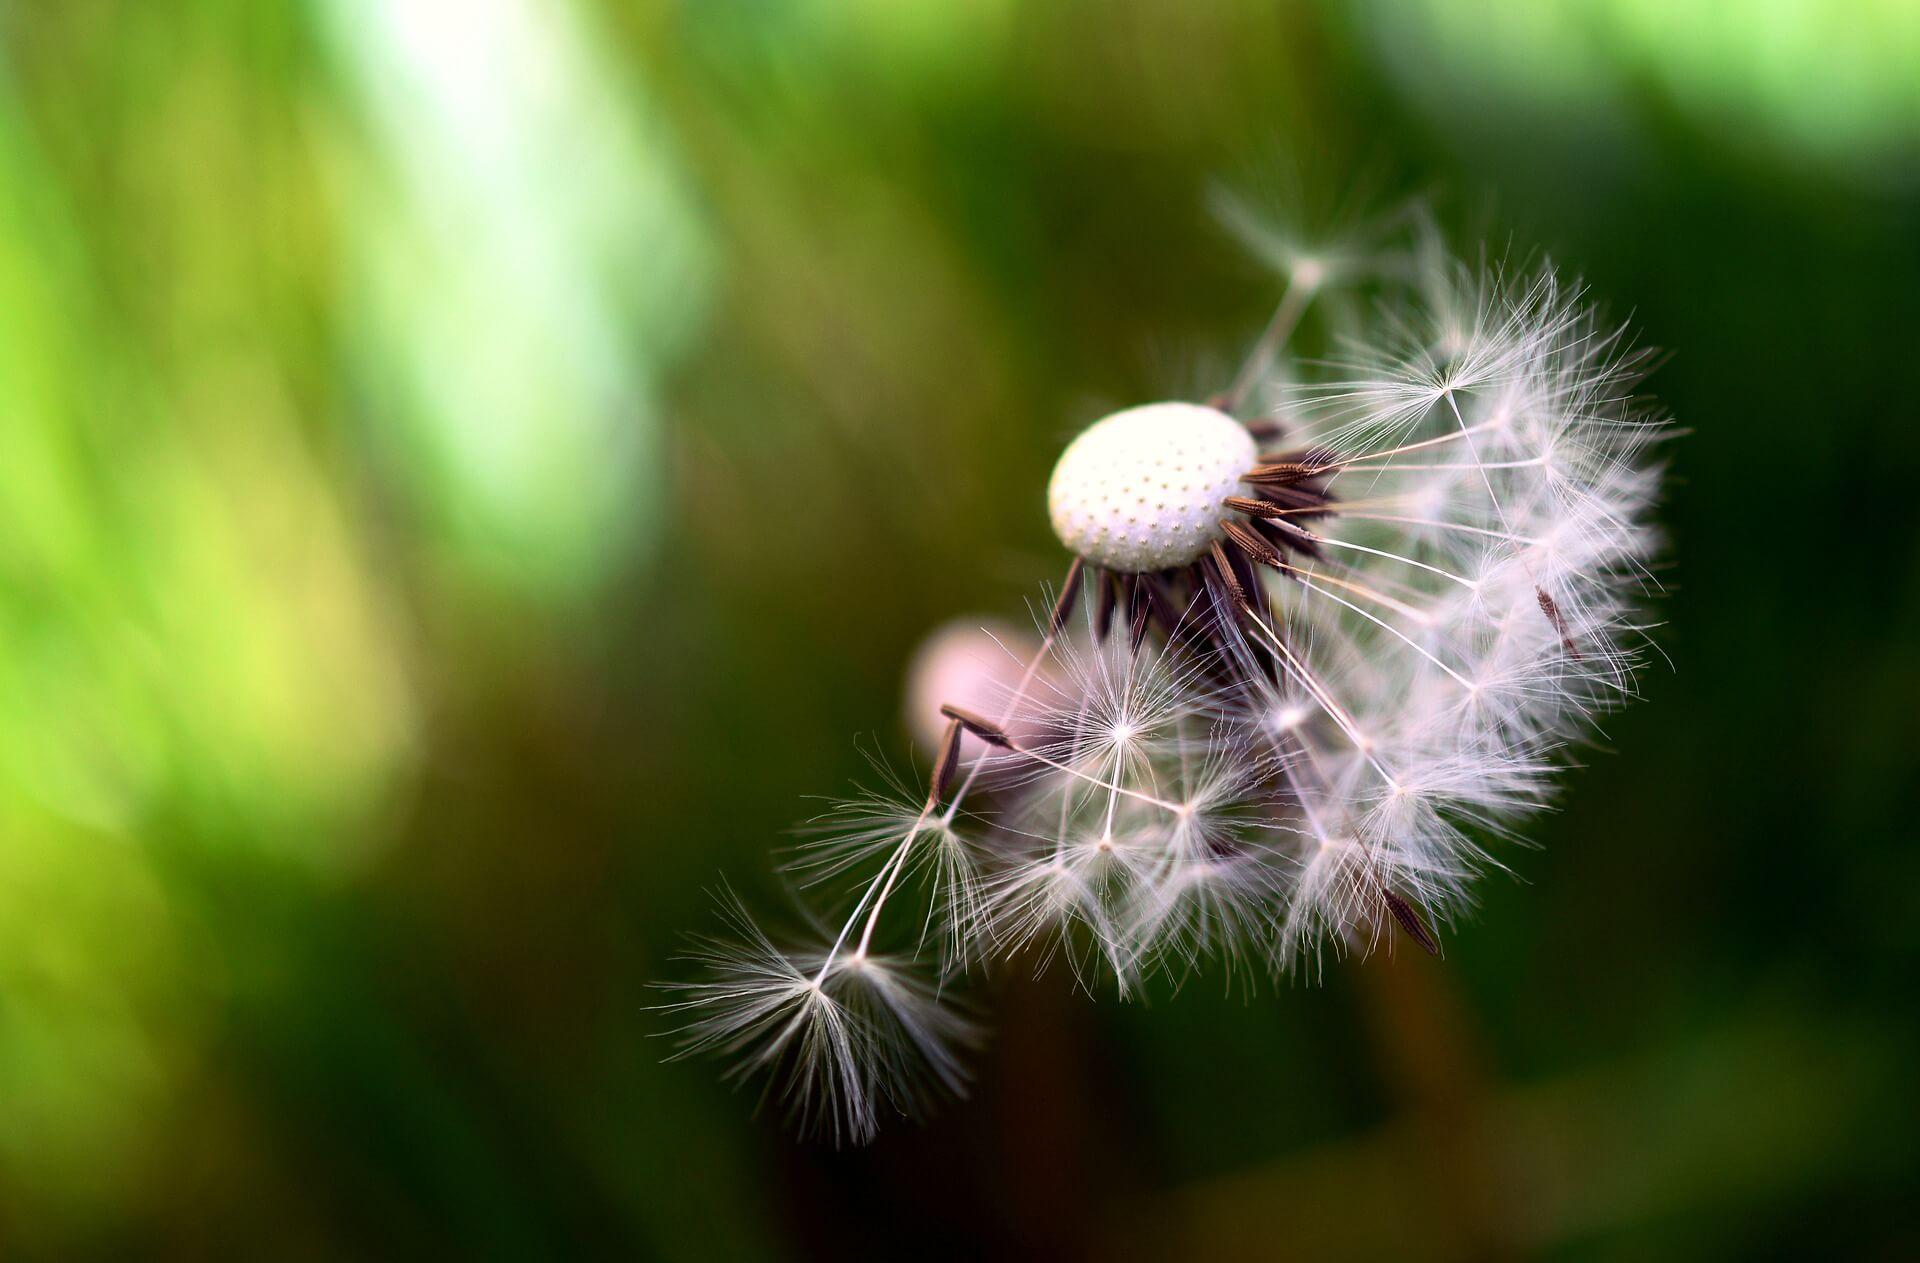 Pusteblume-Natur-Hoffnung-Fehlgeburt-verarbeiten